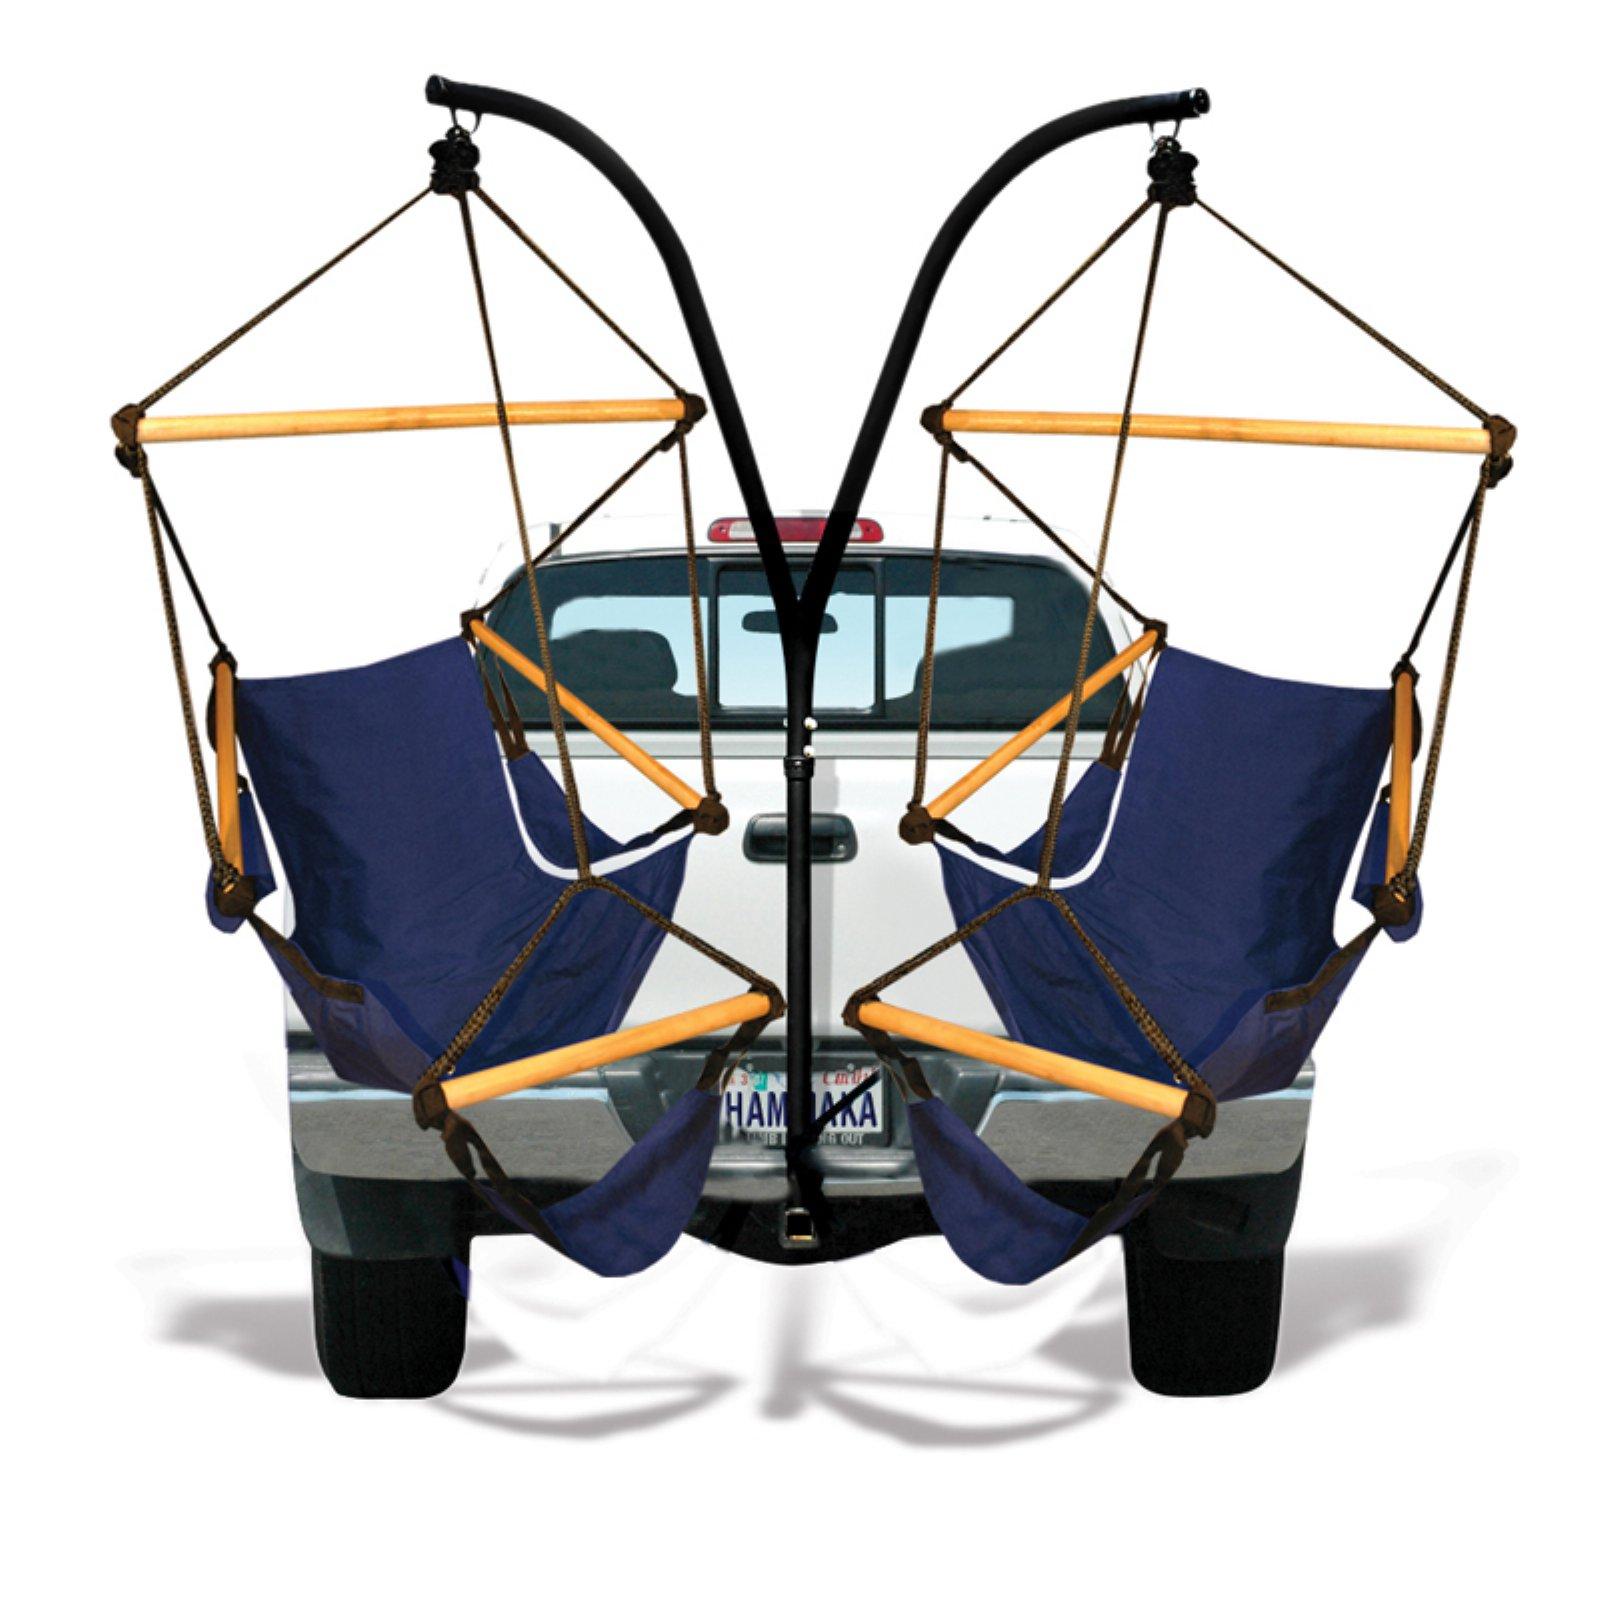 Hammaka Trailer Hitch Hanging Chair Stand with Hammaka Chairs by Hammaka